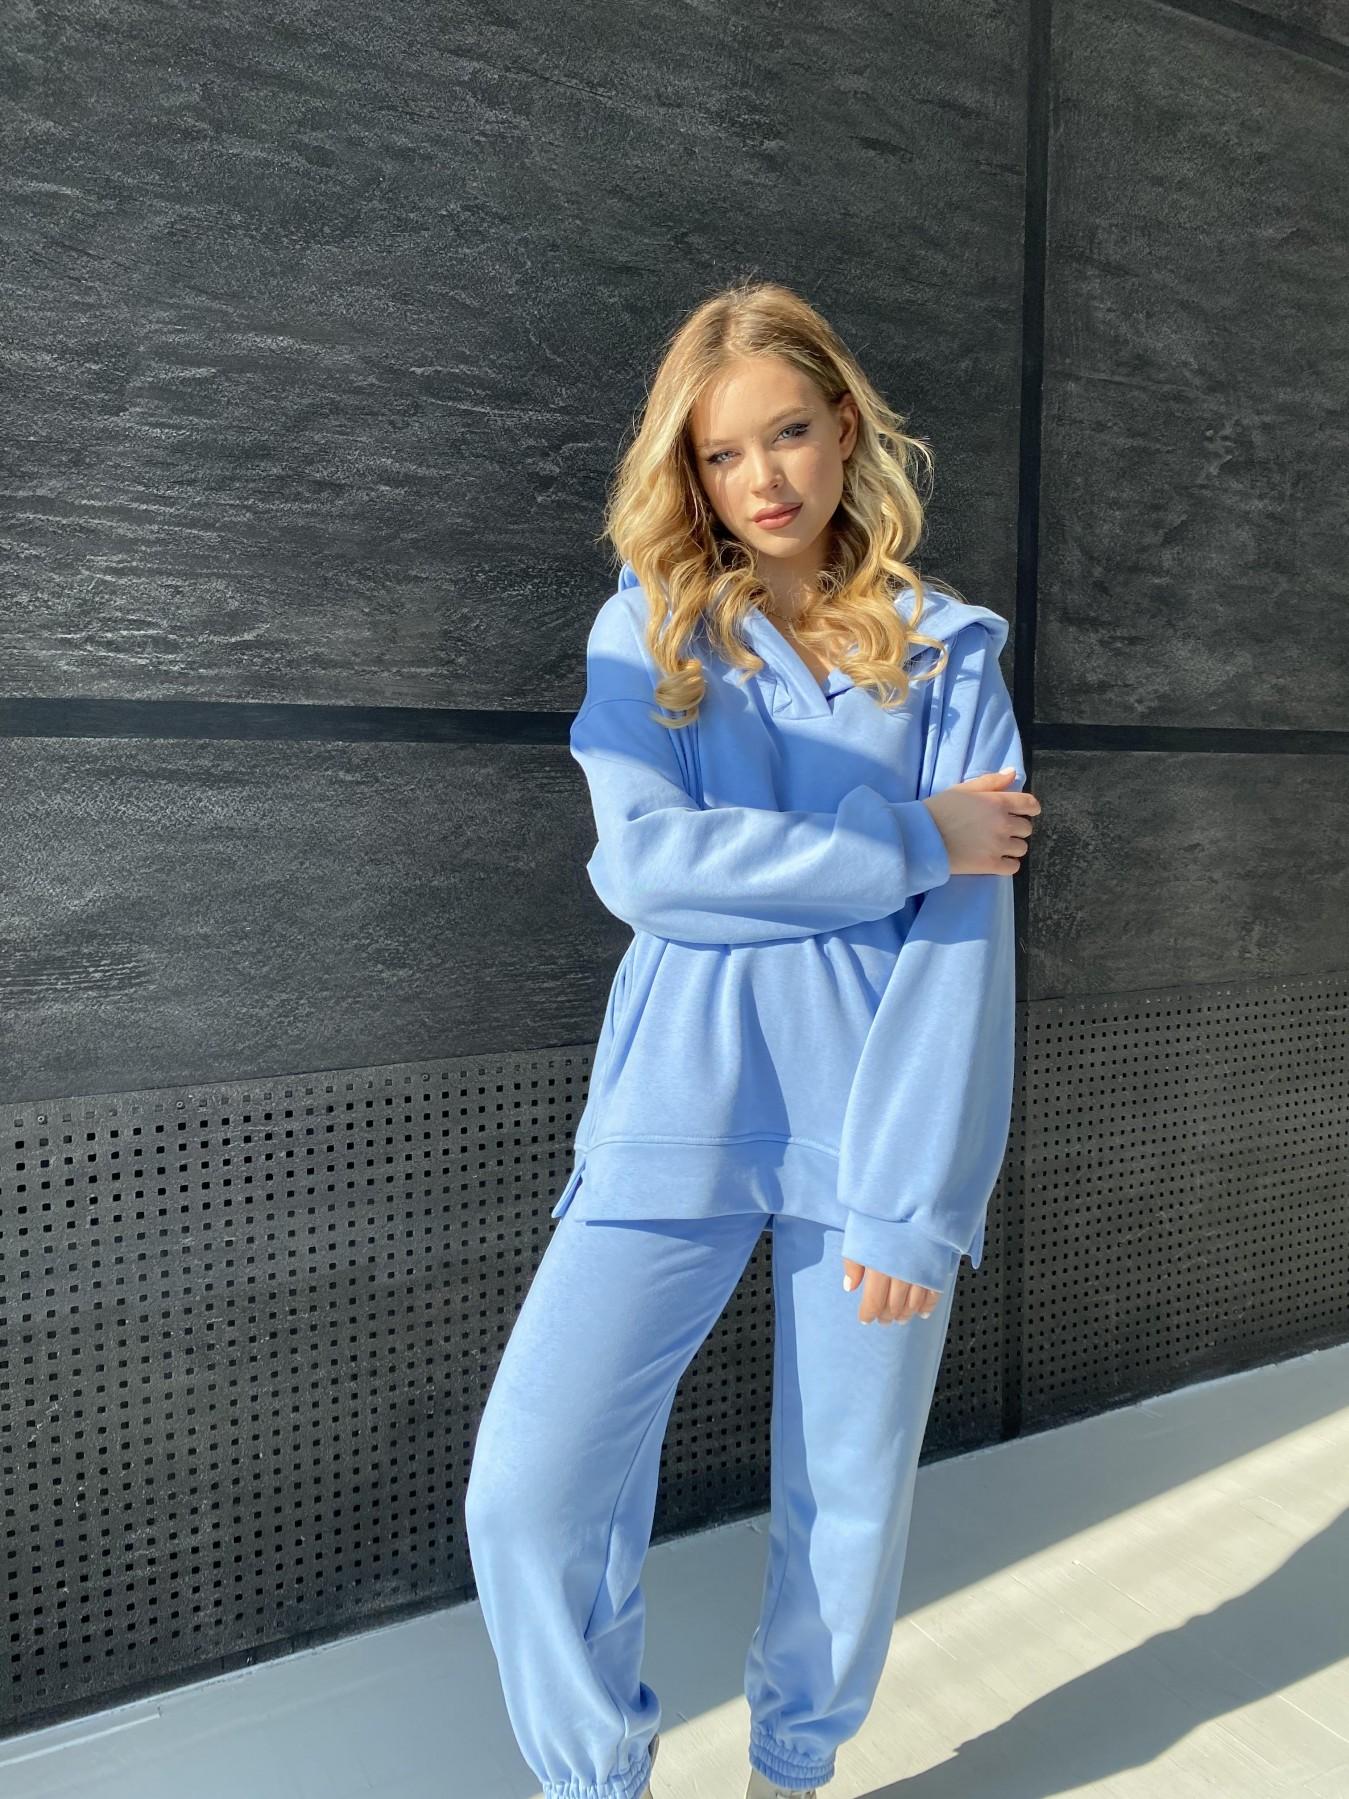 Ярис костюм из 3х нитки 10789 АРТ. 47260 Цвет: Голубой - фото 2, интернет магазин tm-modus.ru